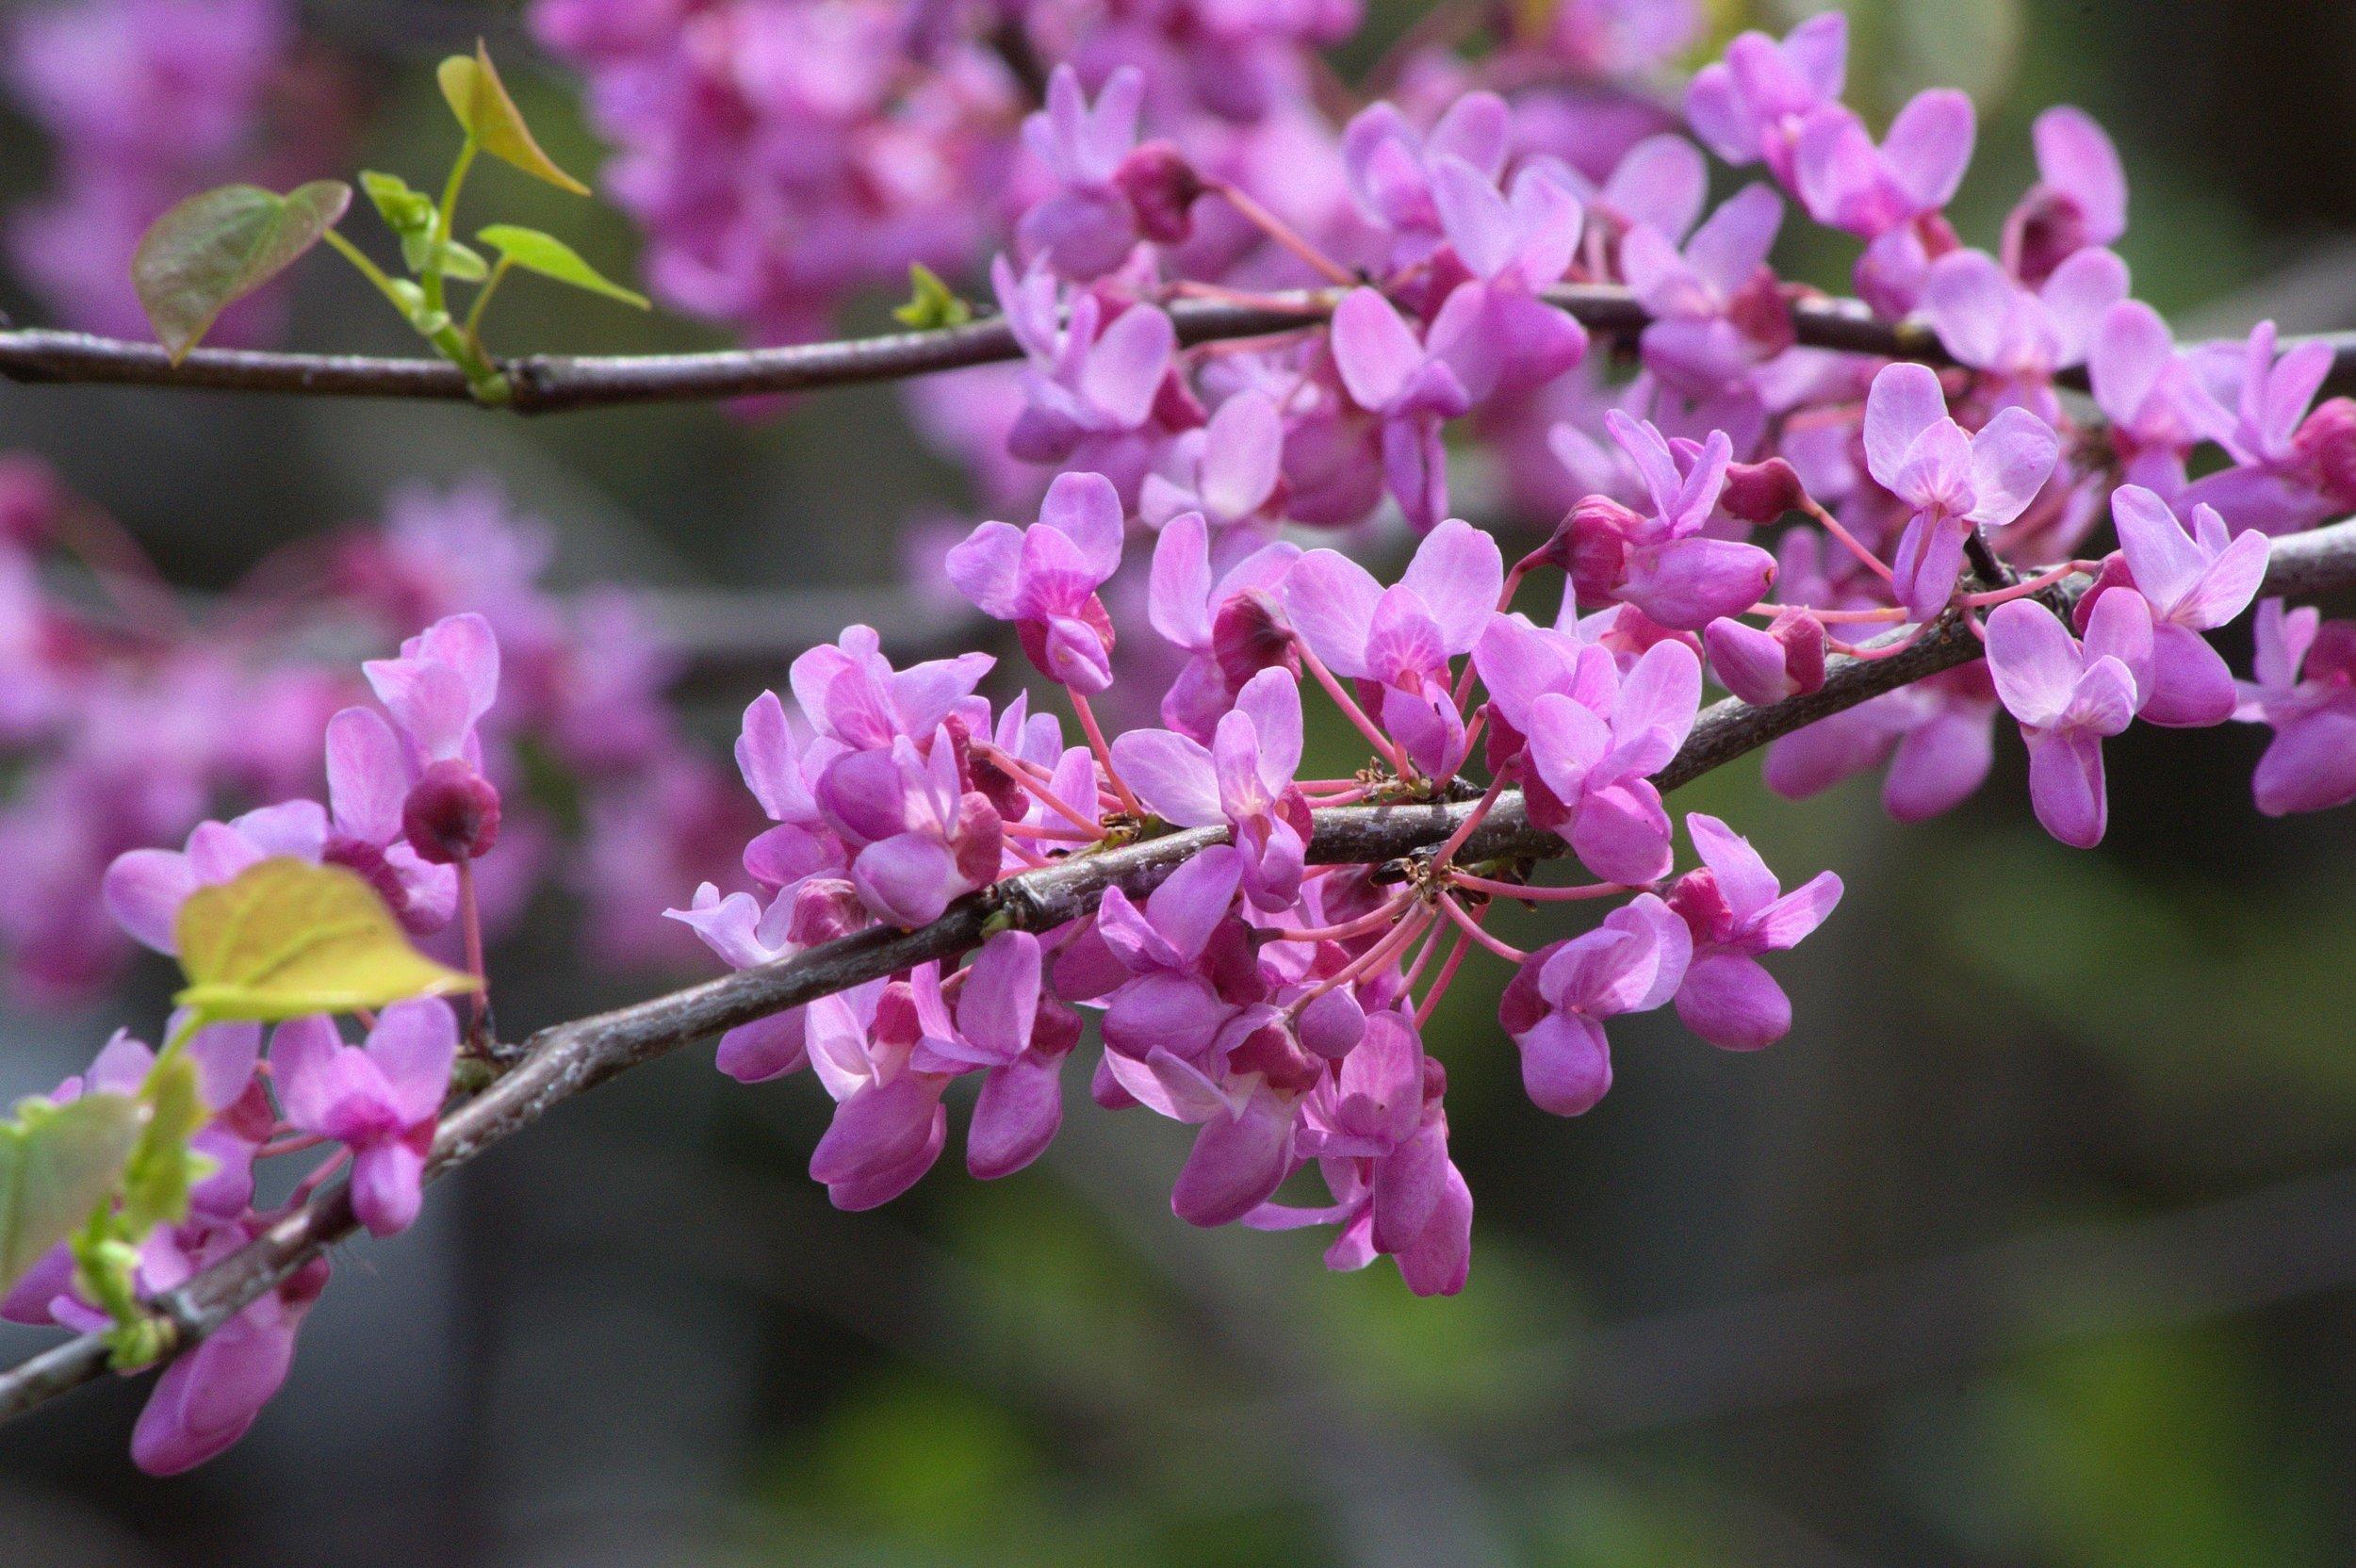 arkansas-redbud-blossoms-3588715.jpg